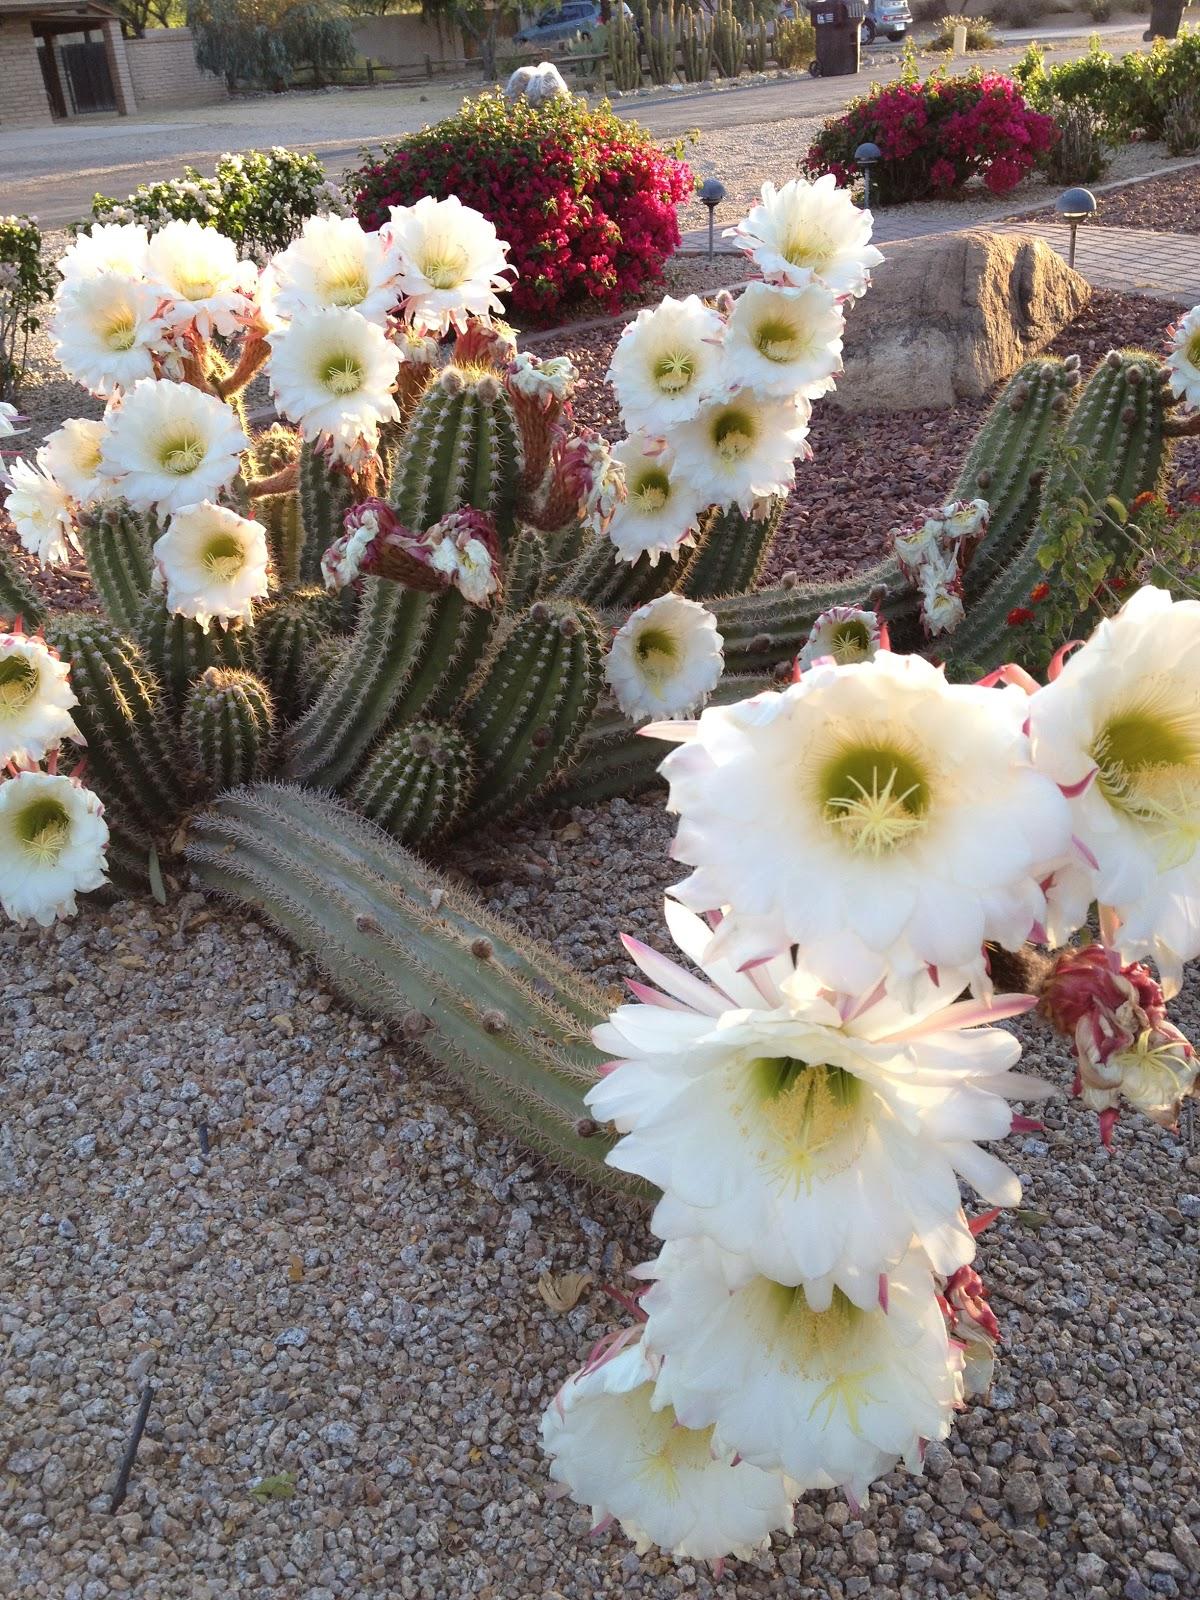 Amazing argentine giant cactus flowers i love scottsdale for Cactus argentina